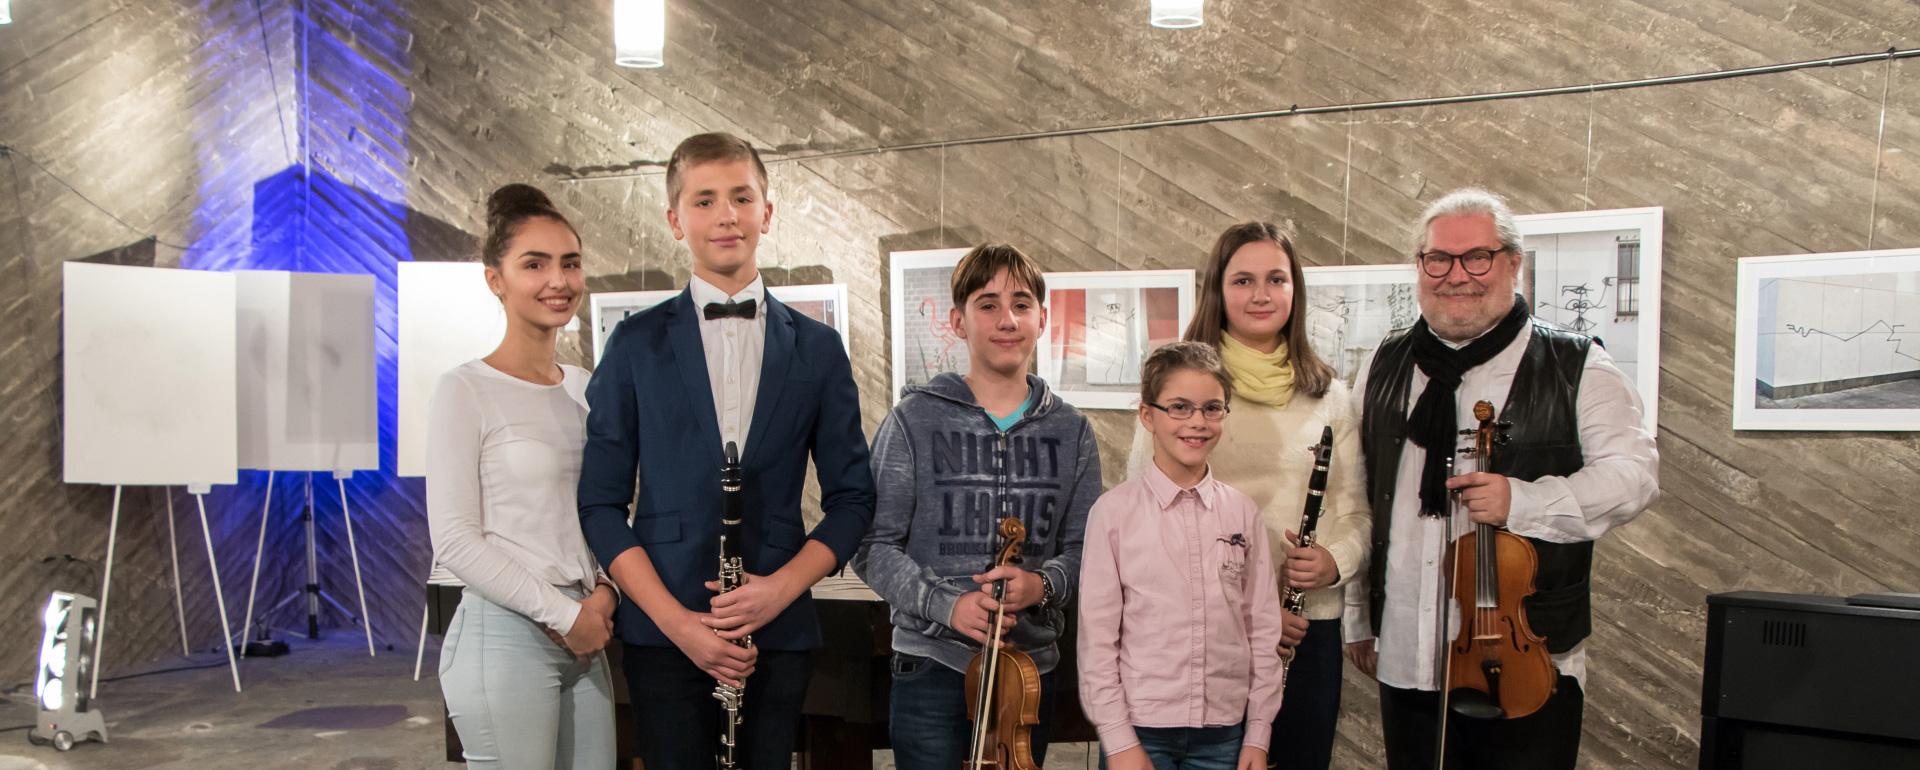 museumsnacht köln 2017 kulturkirche ost gag epstein